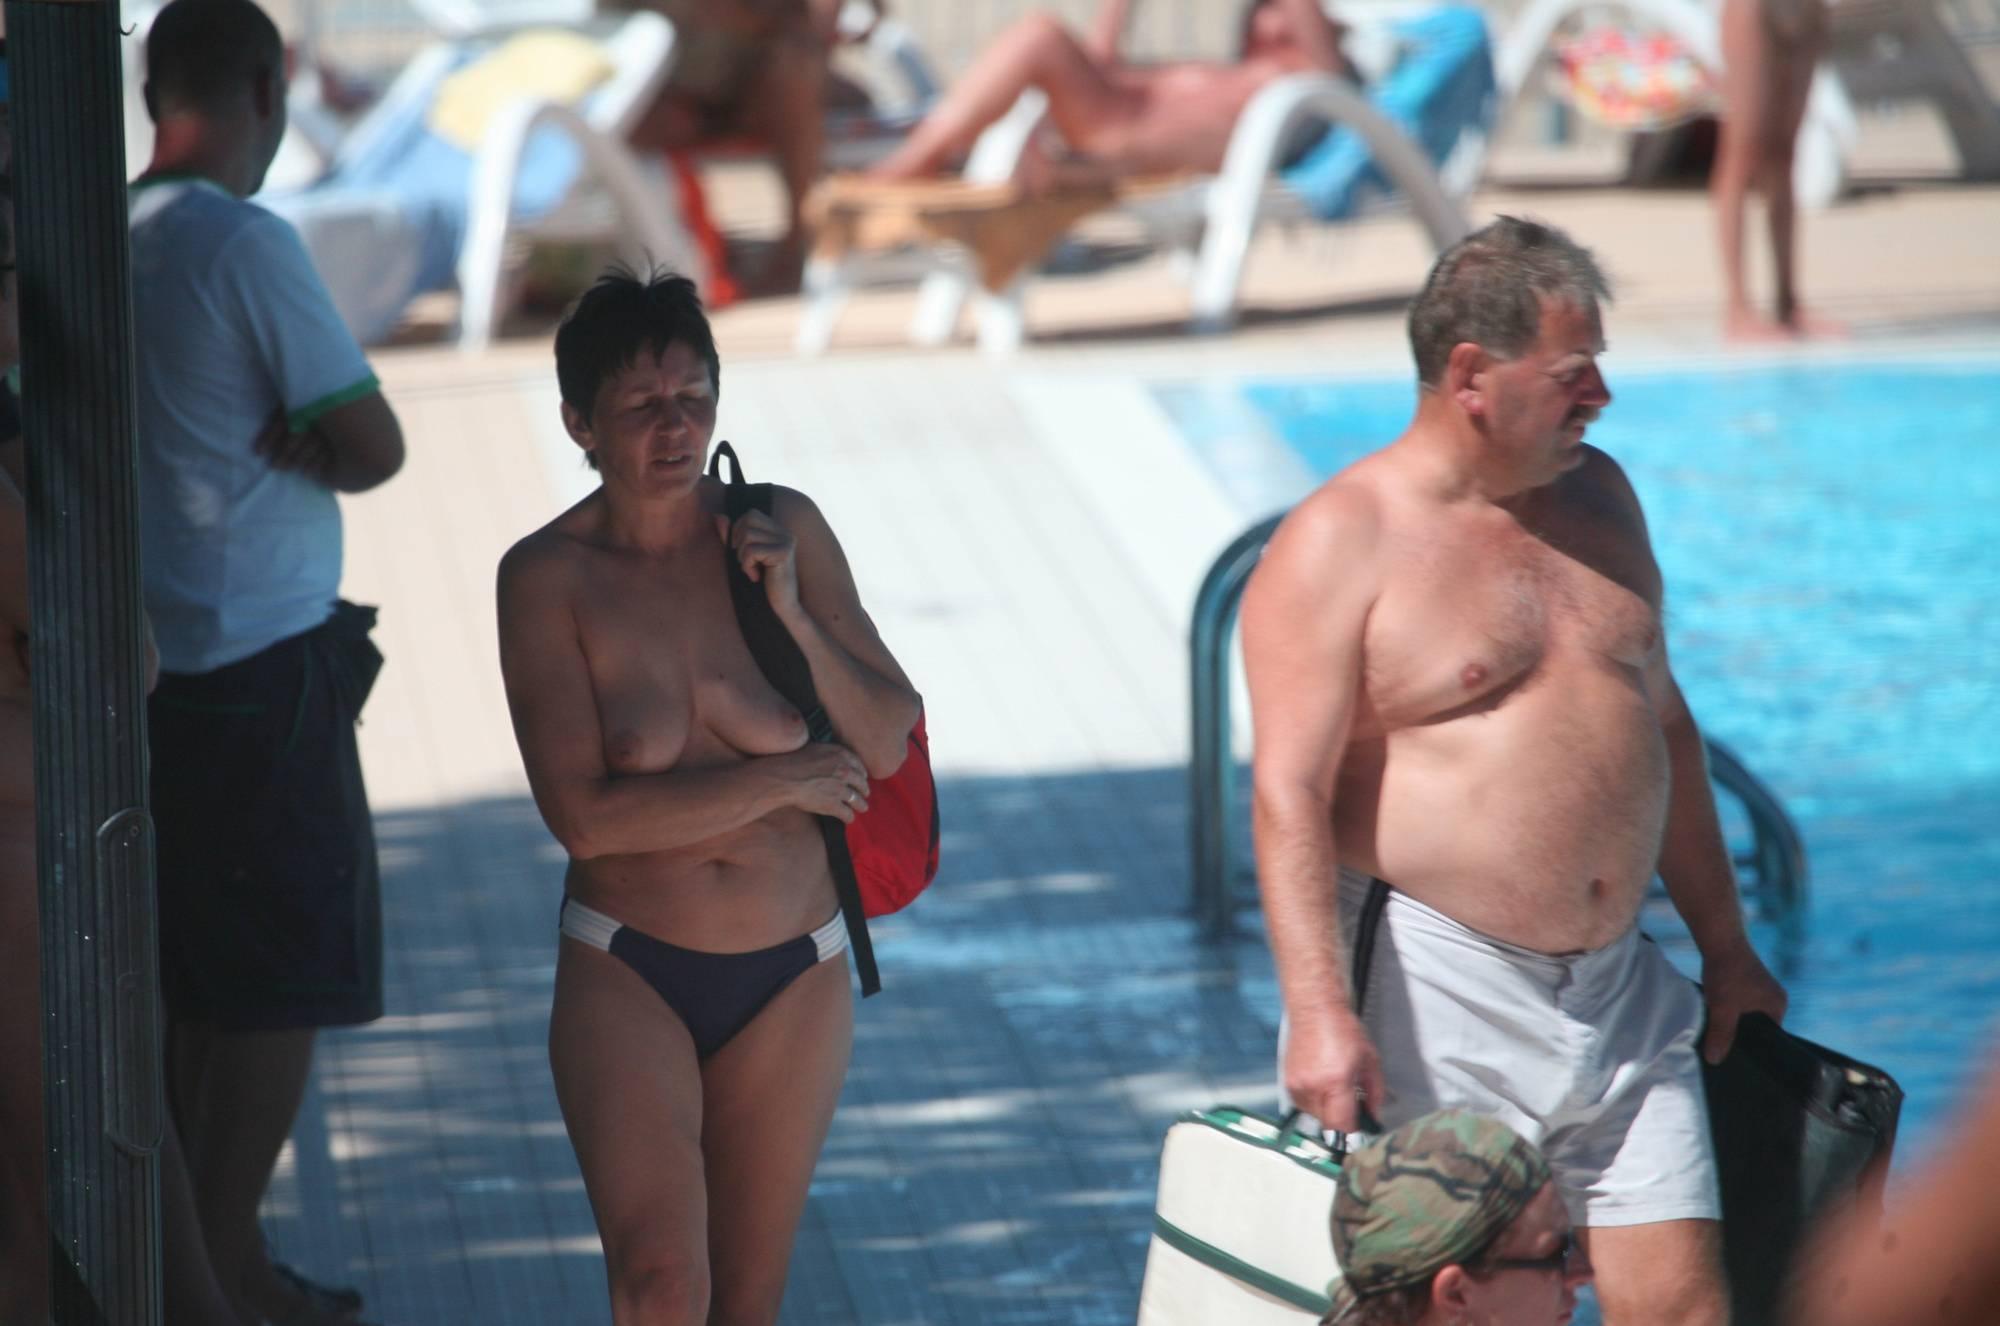 Nudist Pool Walk Around - 4